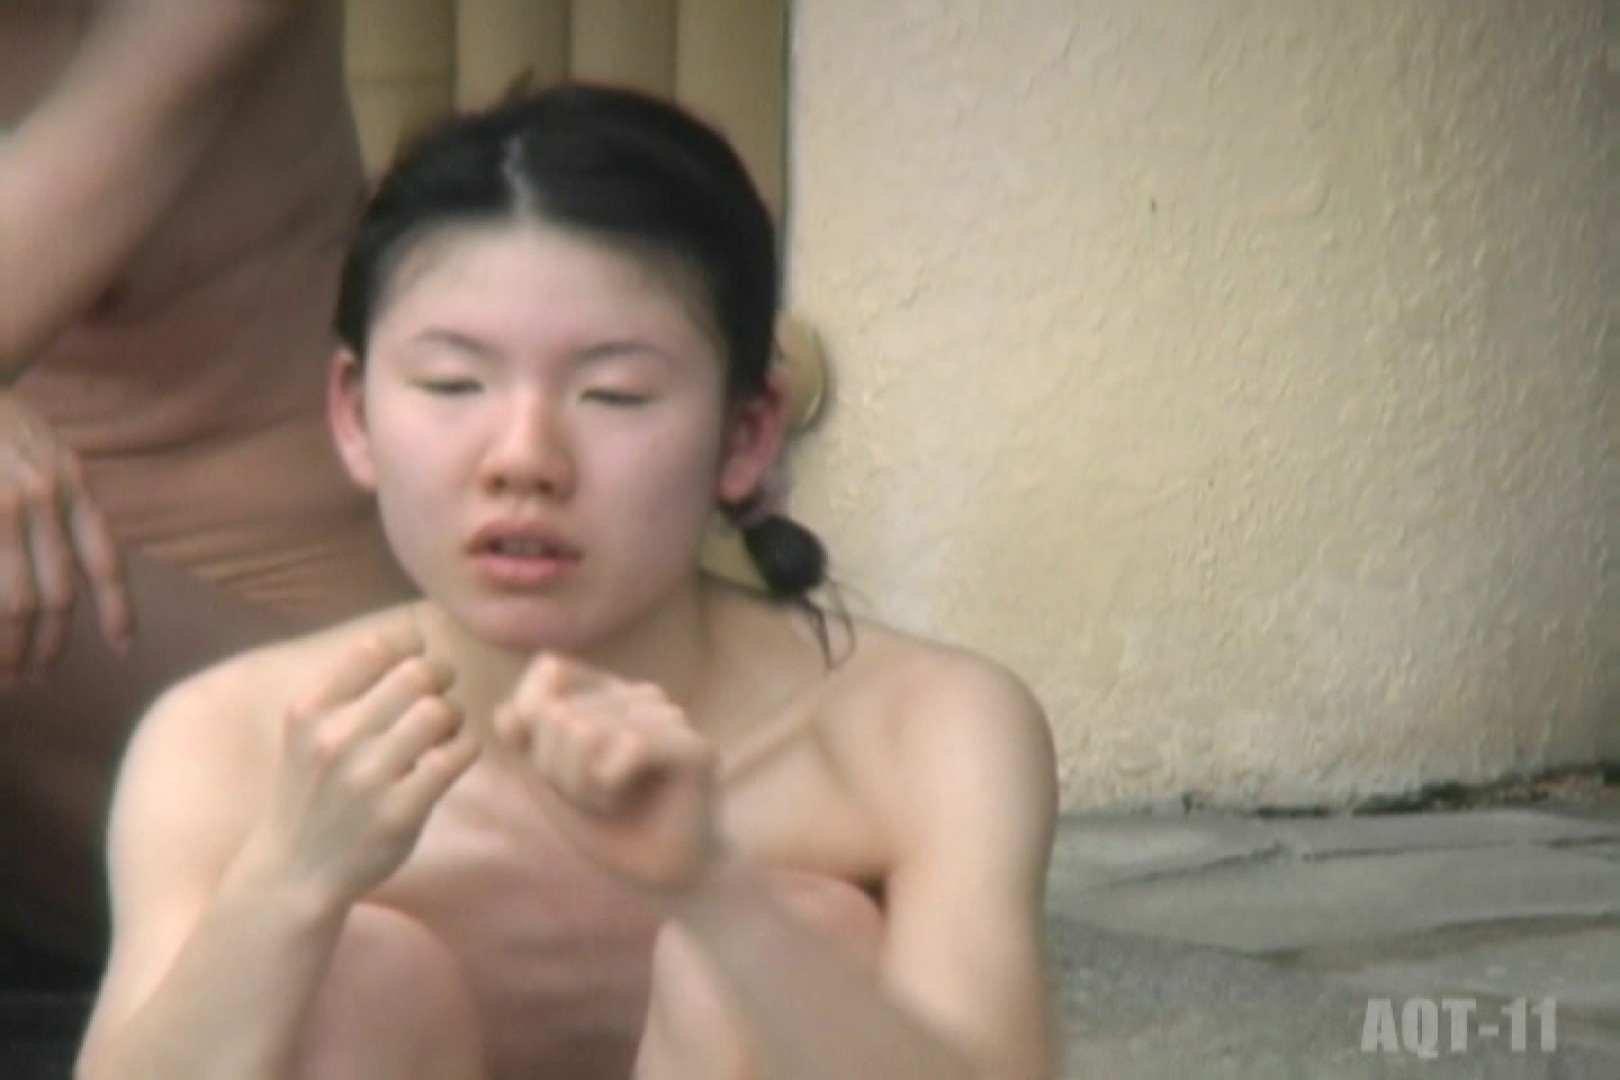 Aquaな露天風呂Vol.804 エロいOL AV無料動画キャプチャ 88枚